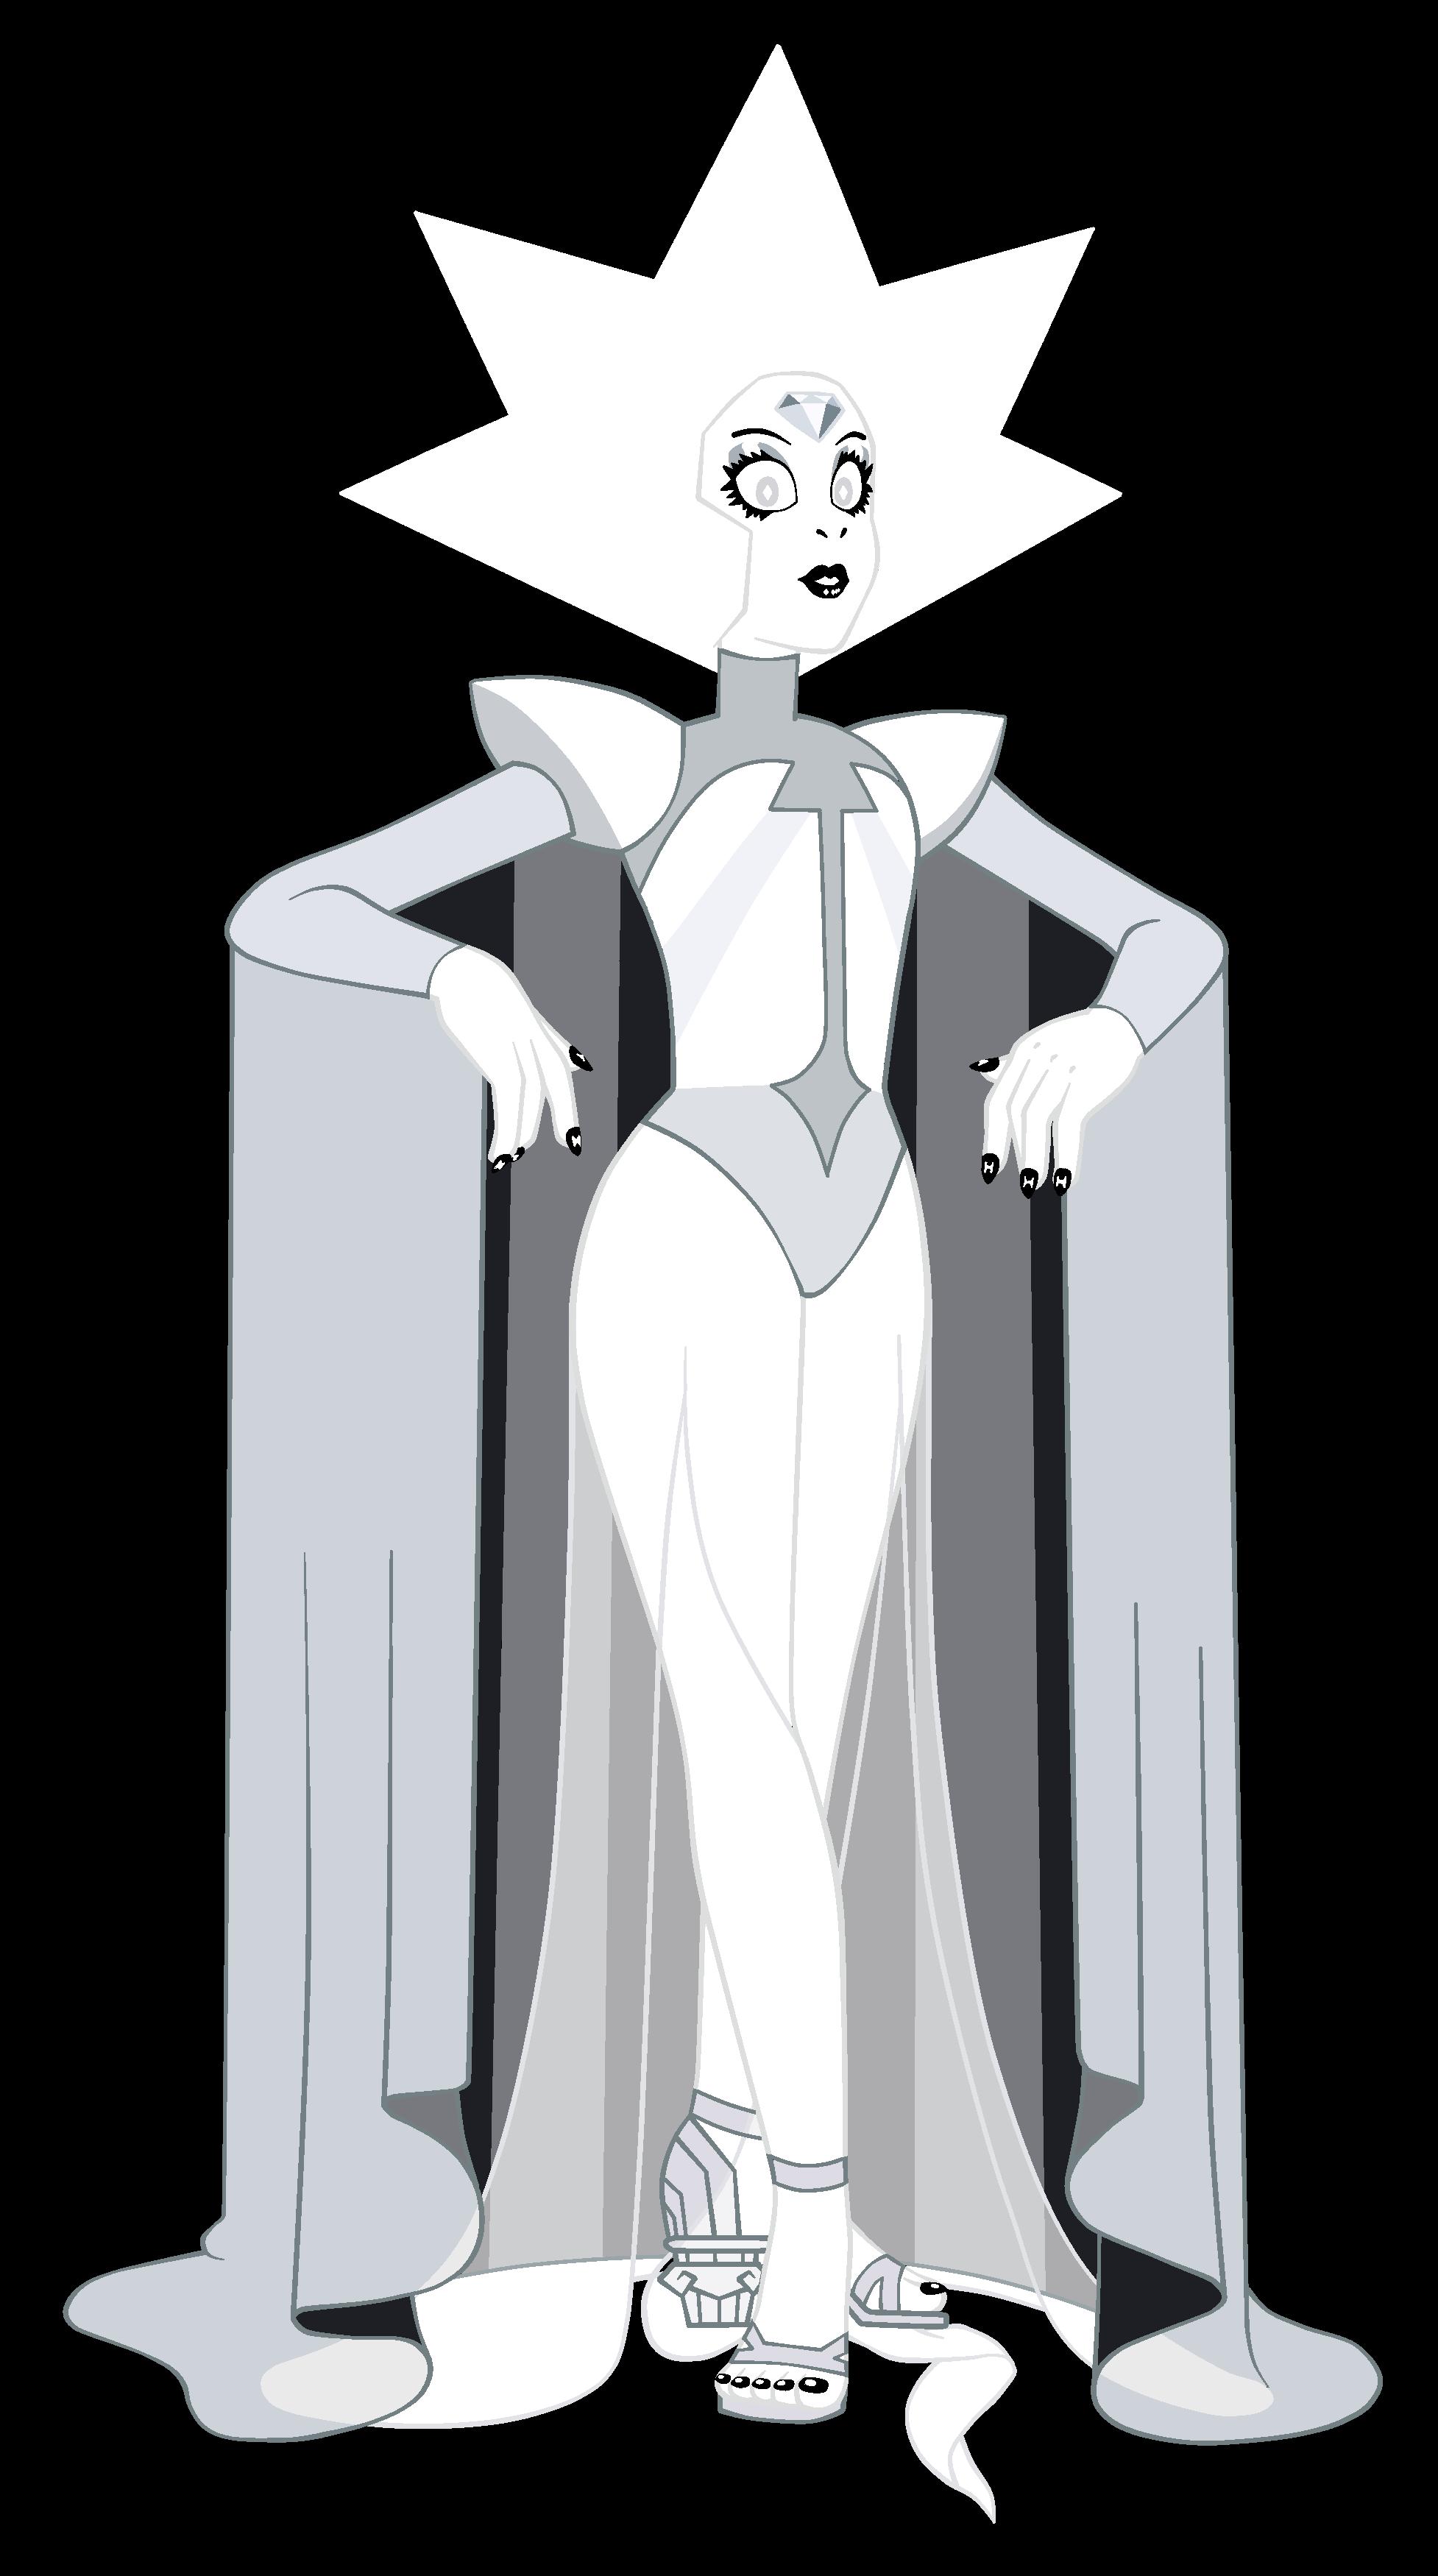 Whitediamond By Koo Png Steven Universe Diamond White Diamond Steven Universe Steven Universe Gem